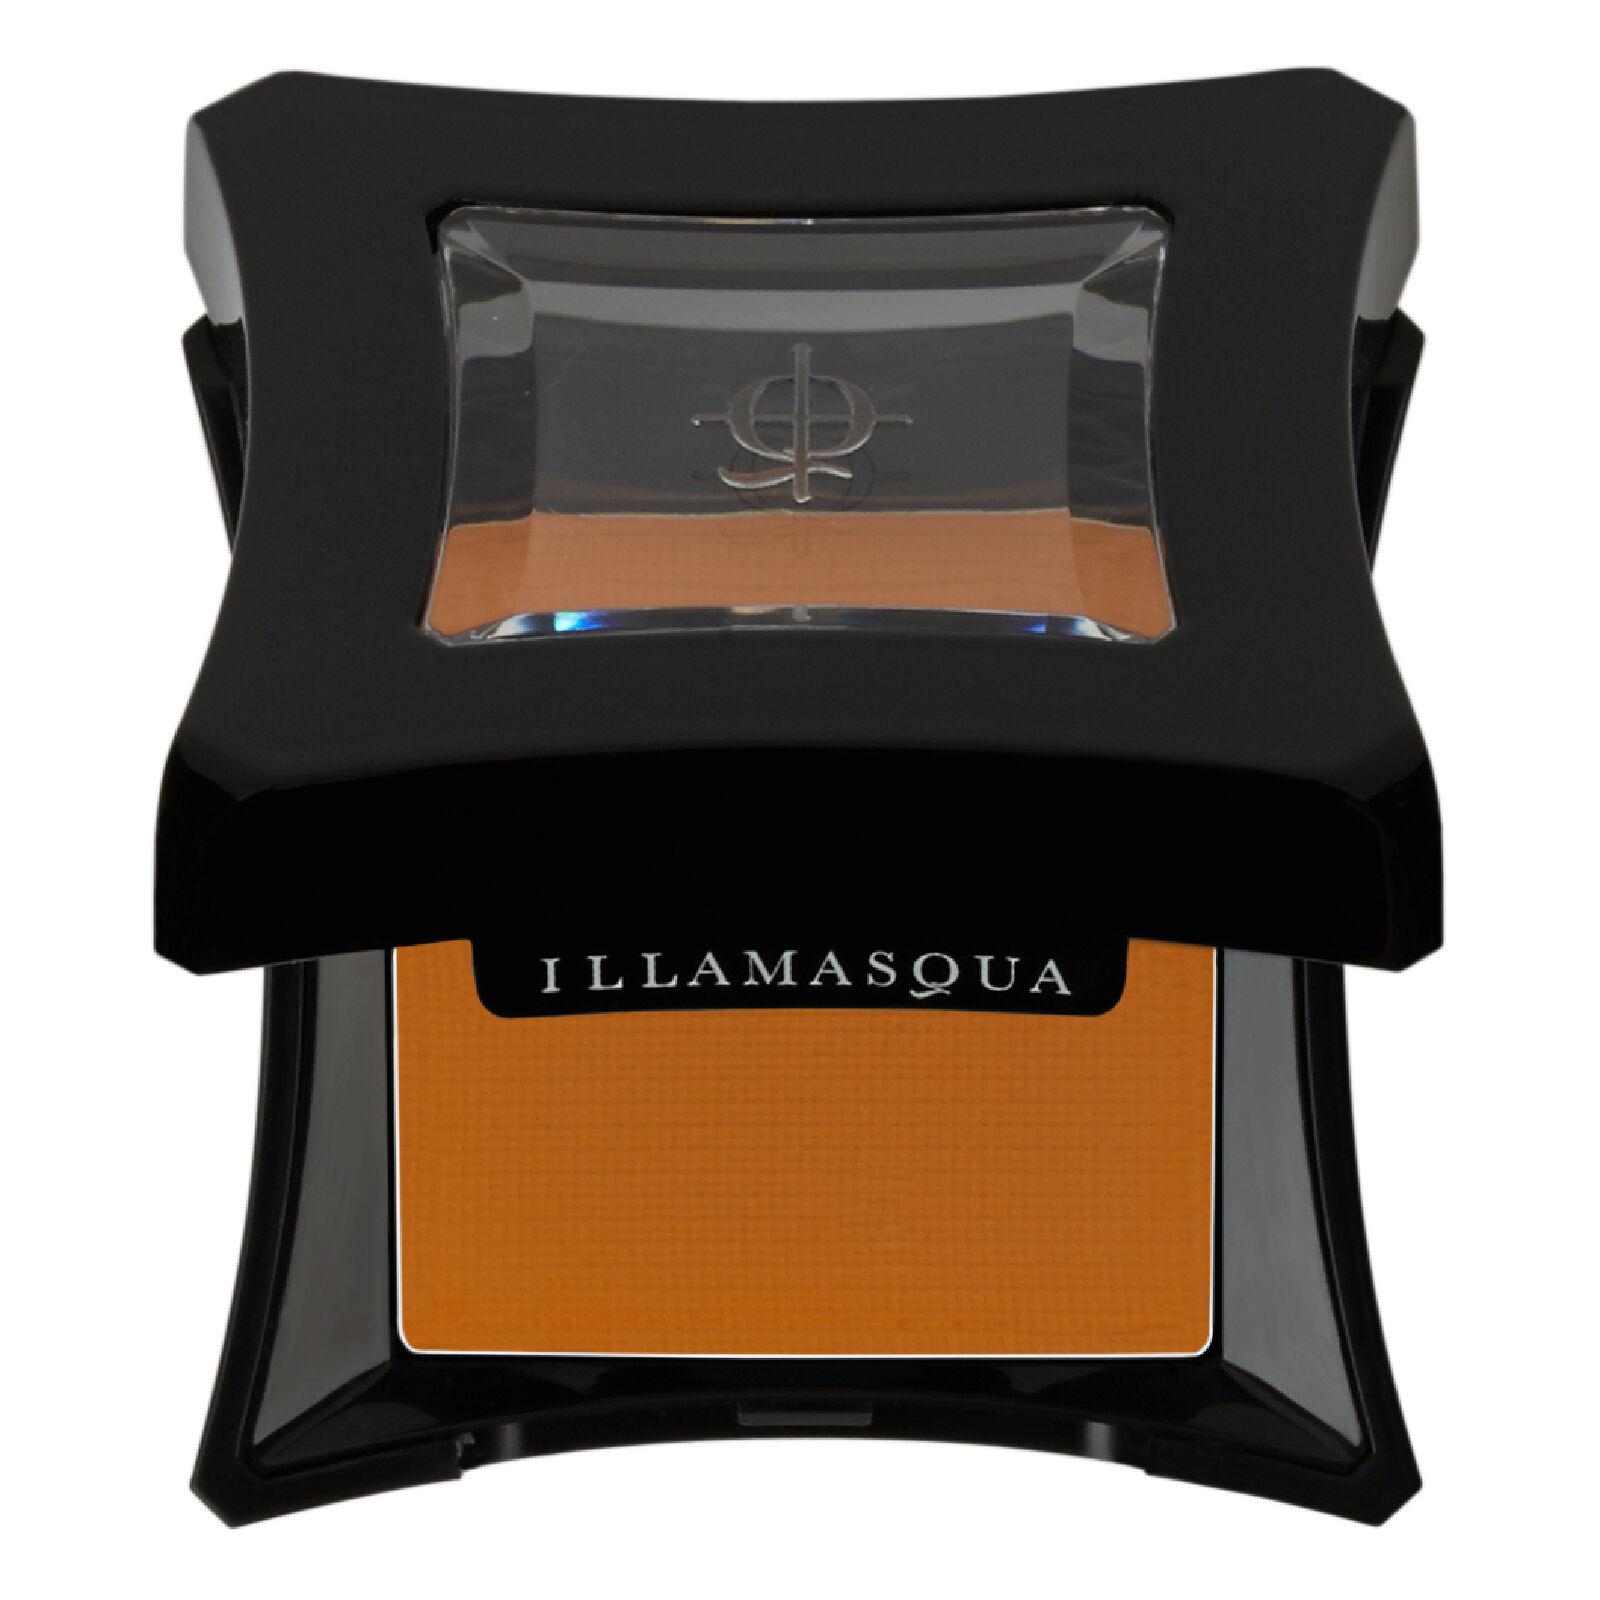 Illamasqua Powder Eye Shadow 2g (Various Shades) - Vapour